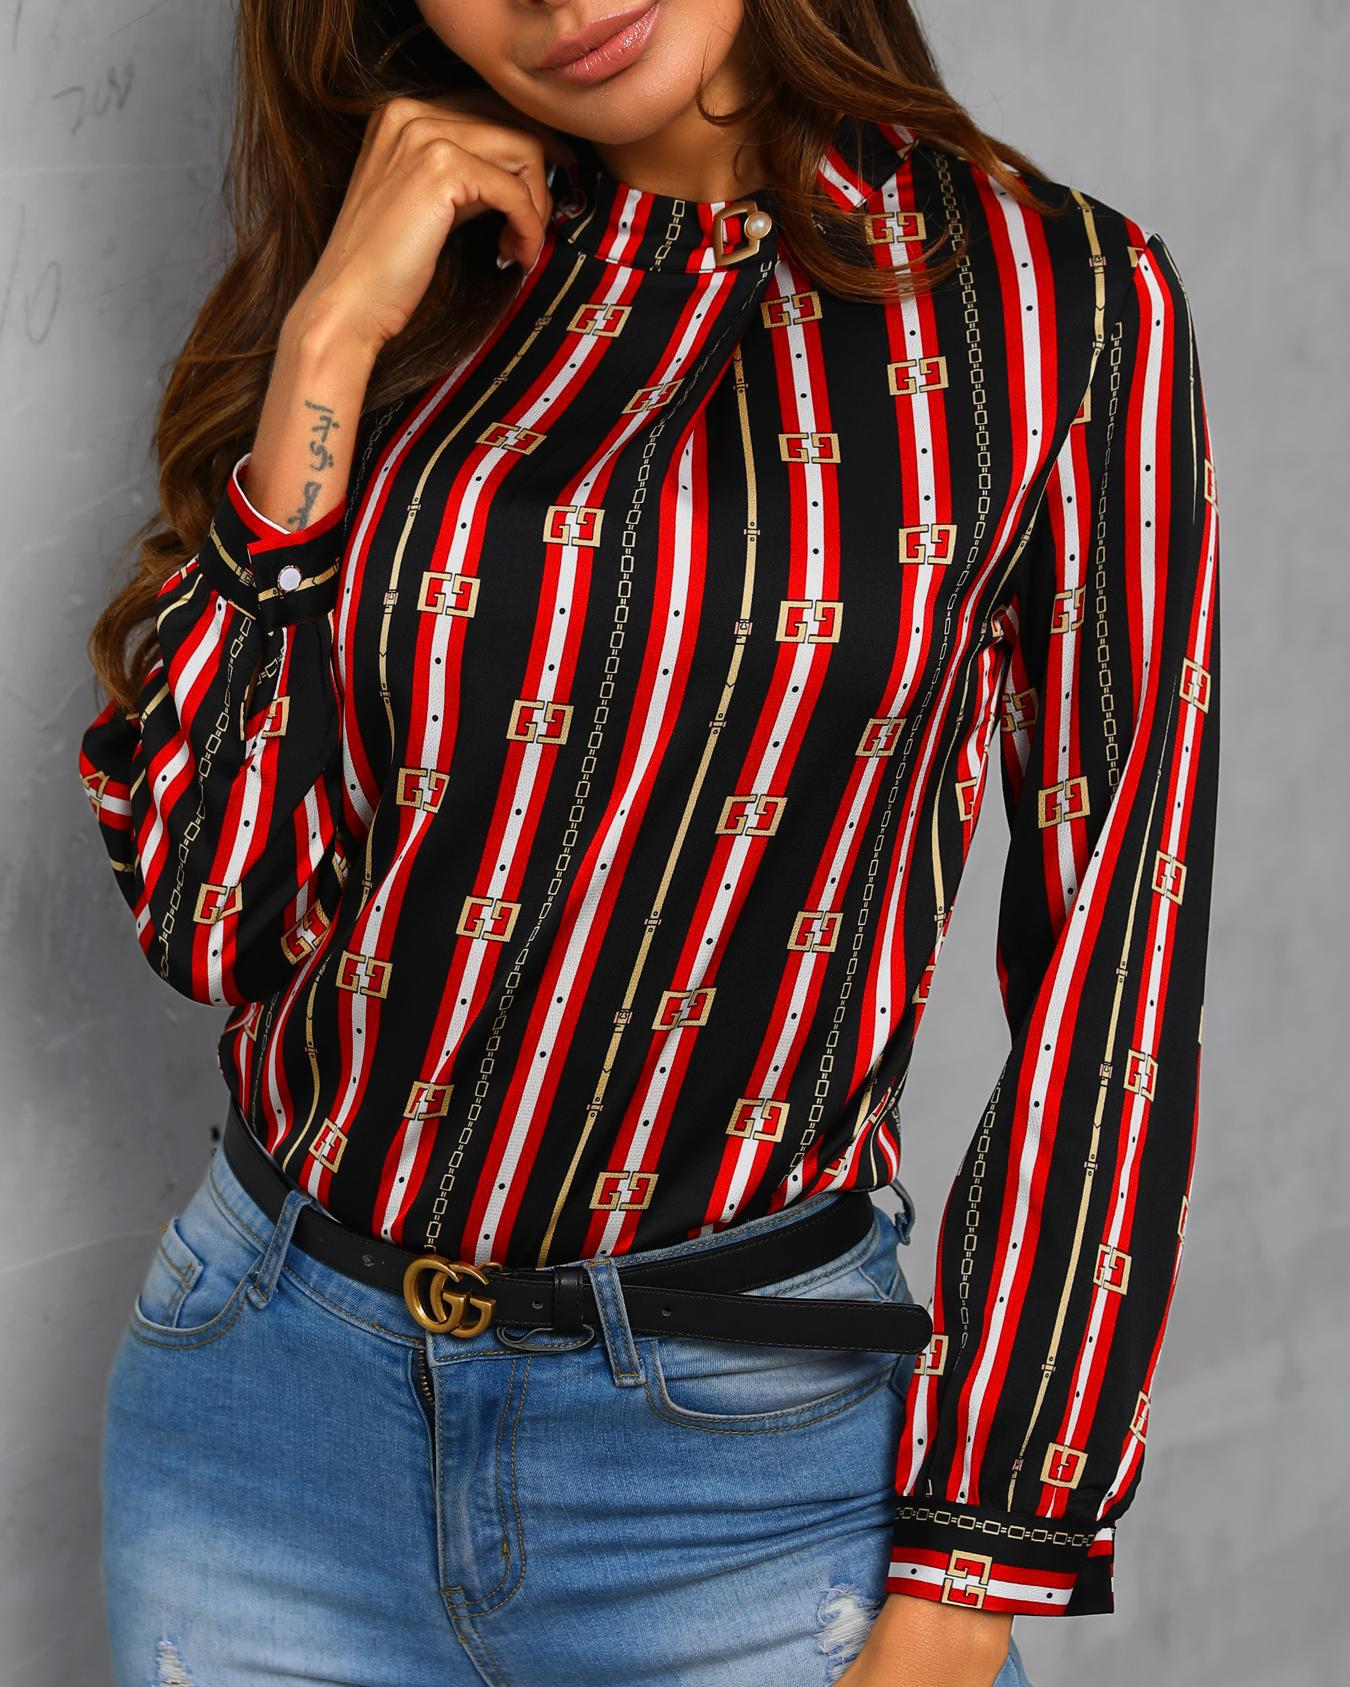 Stripes & Print Keyhole Back Casual Blouse